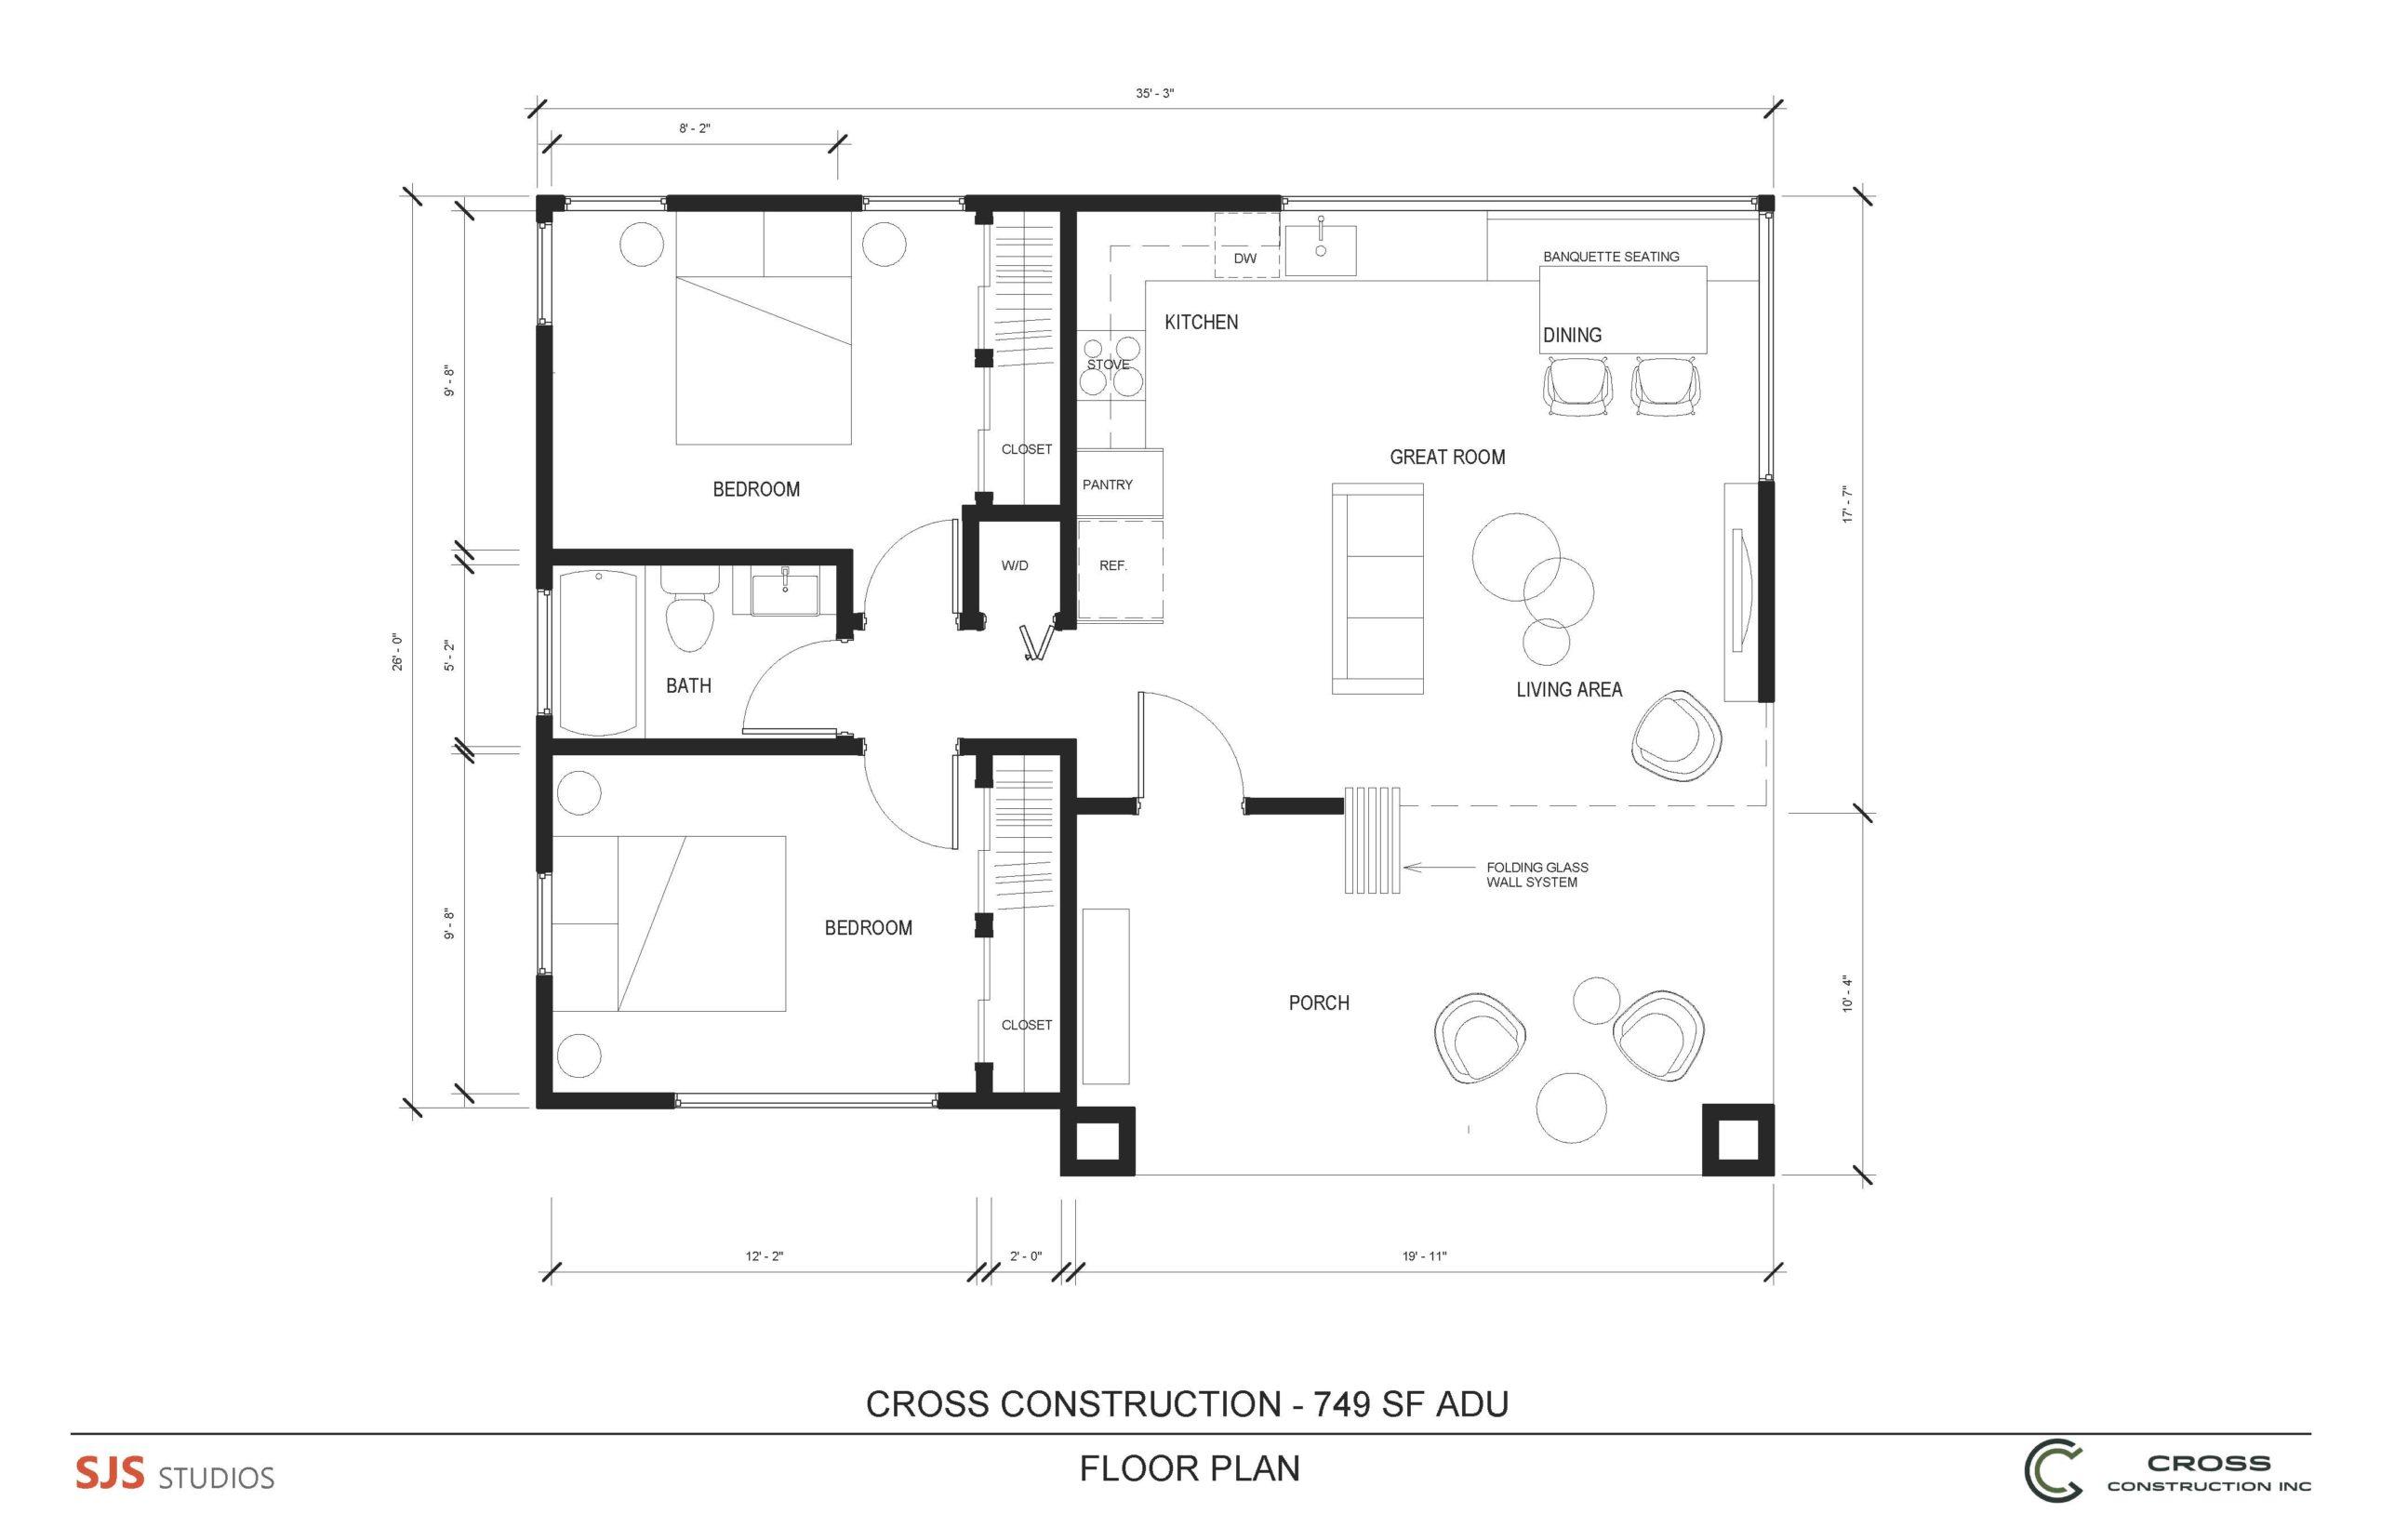 Cross Ready-to-Build_2bd-1bat_749 SF ADU floor plan